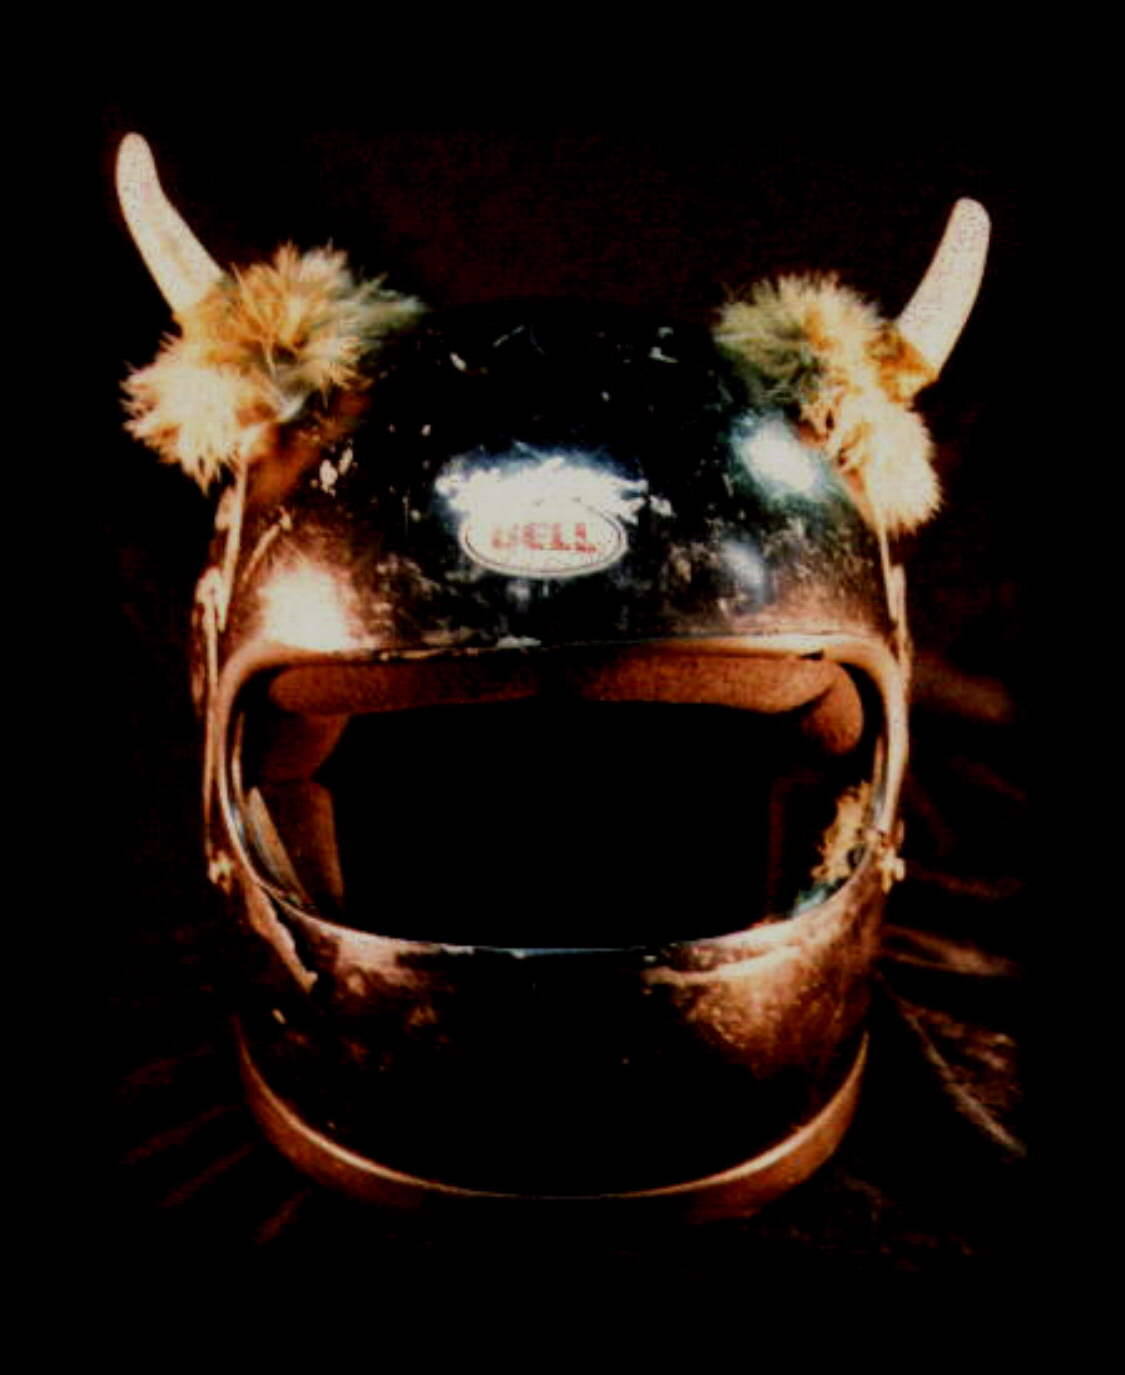 Bell Helmet #1